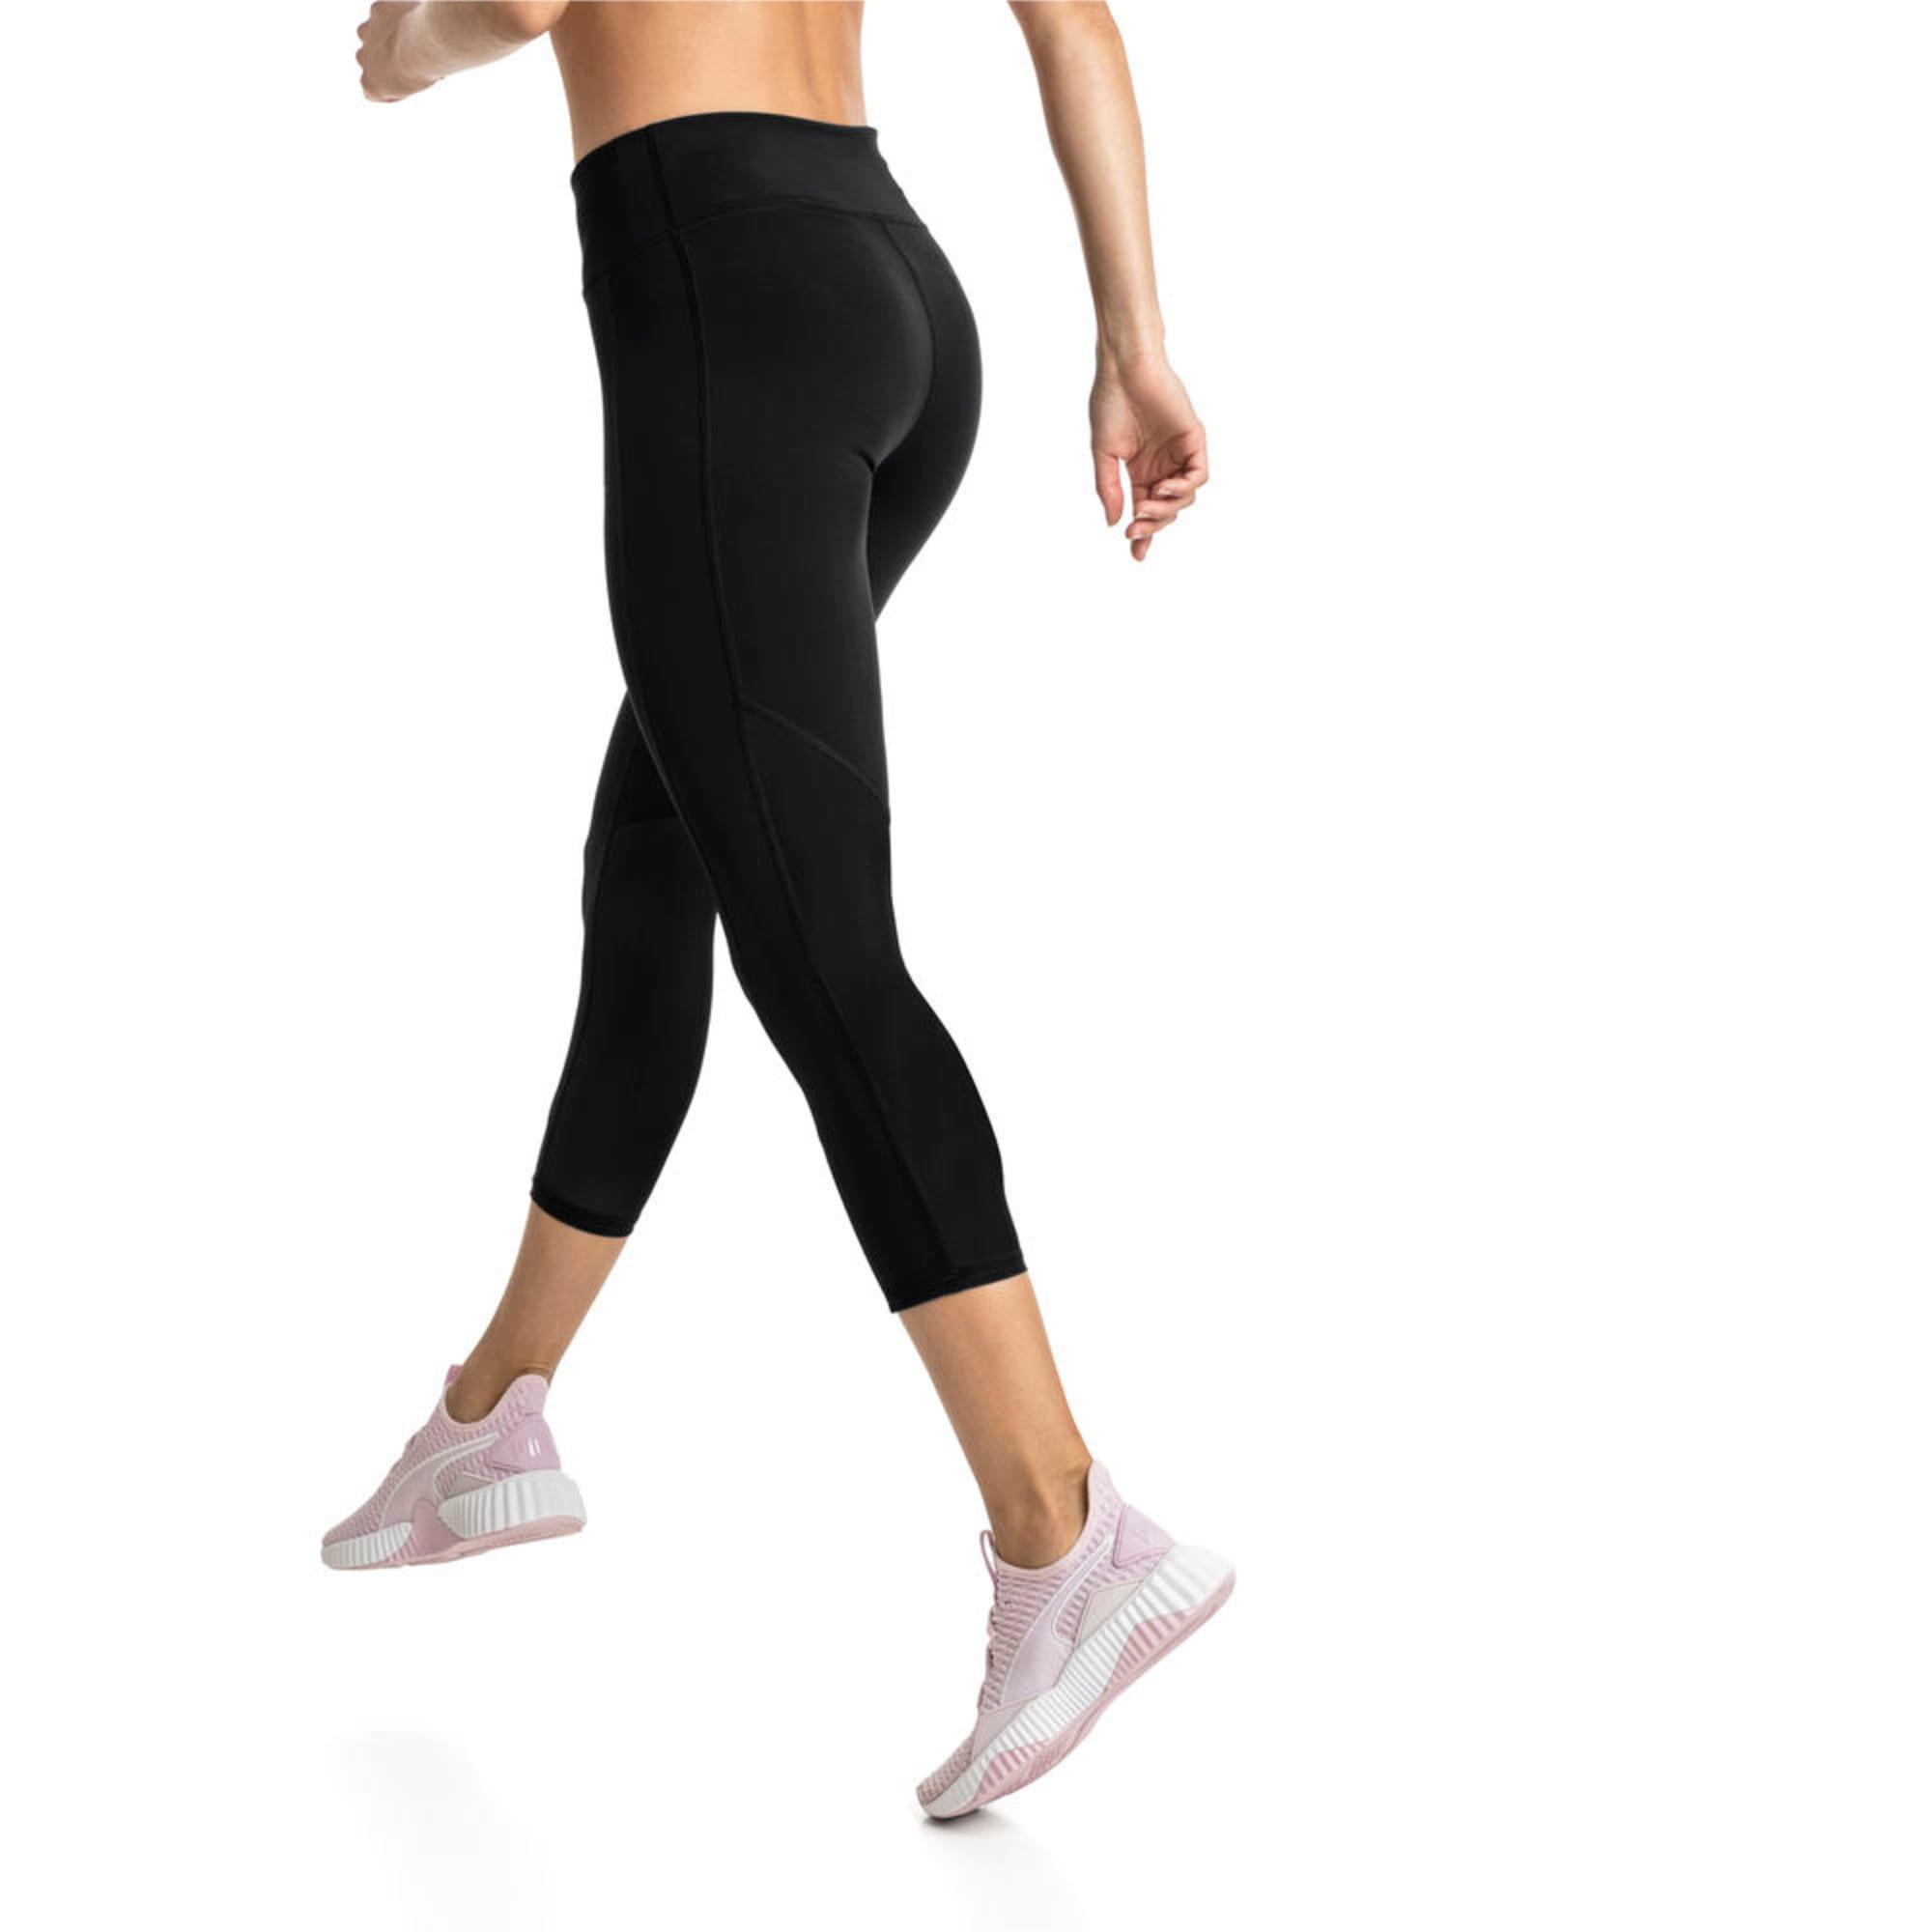 Thumbnail 5 of Always On Solid 3/4 Women's Tights, Puma Black, medium-IND